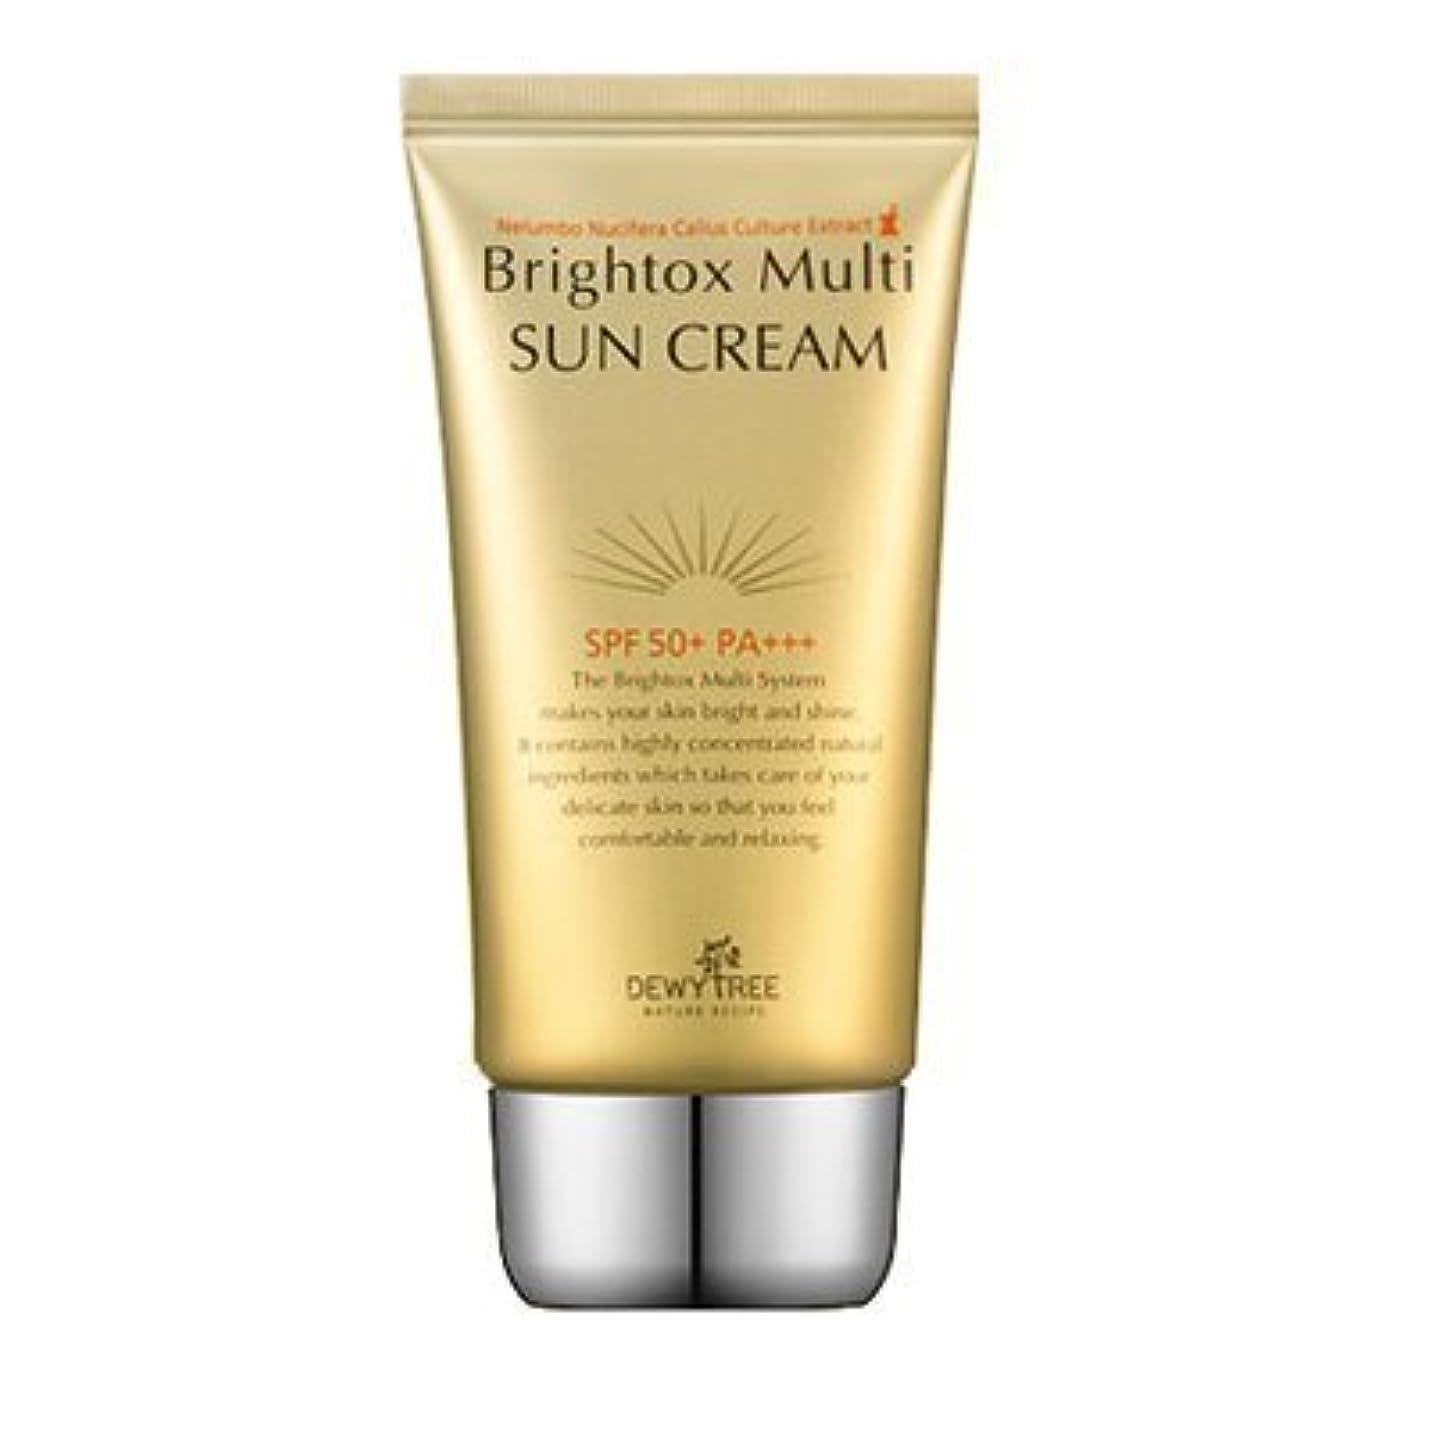 Dewytree Brightox Multi SUN CREAM SPF50+, PA+++50ml